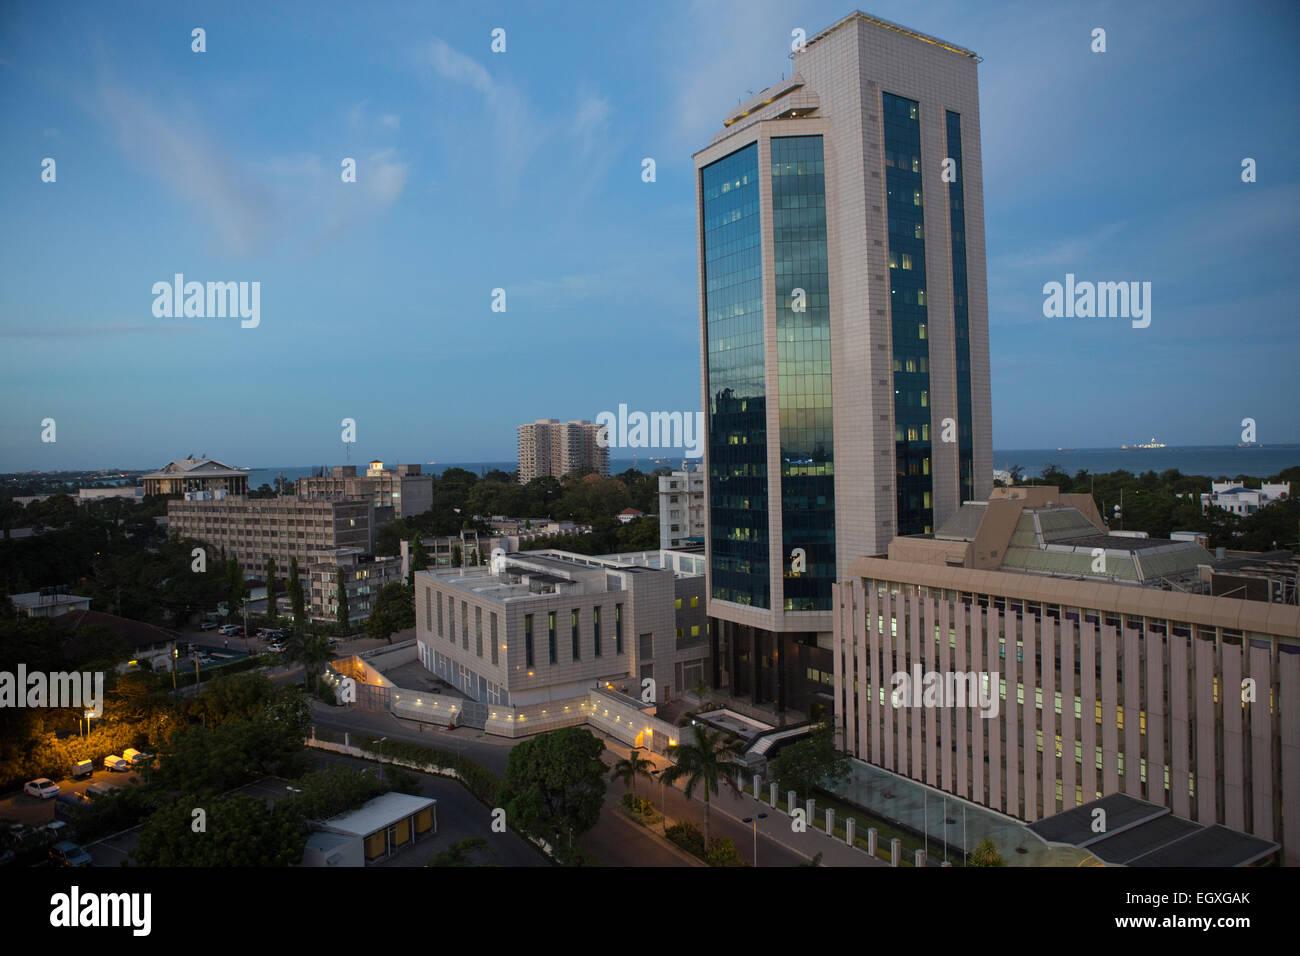 Bank of Tanzania building - Dar es Salaam, Tanzania, East Africa. - Stock Image